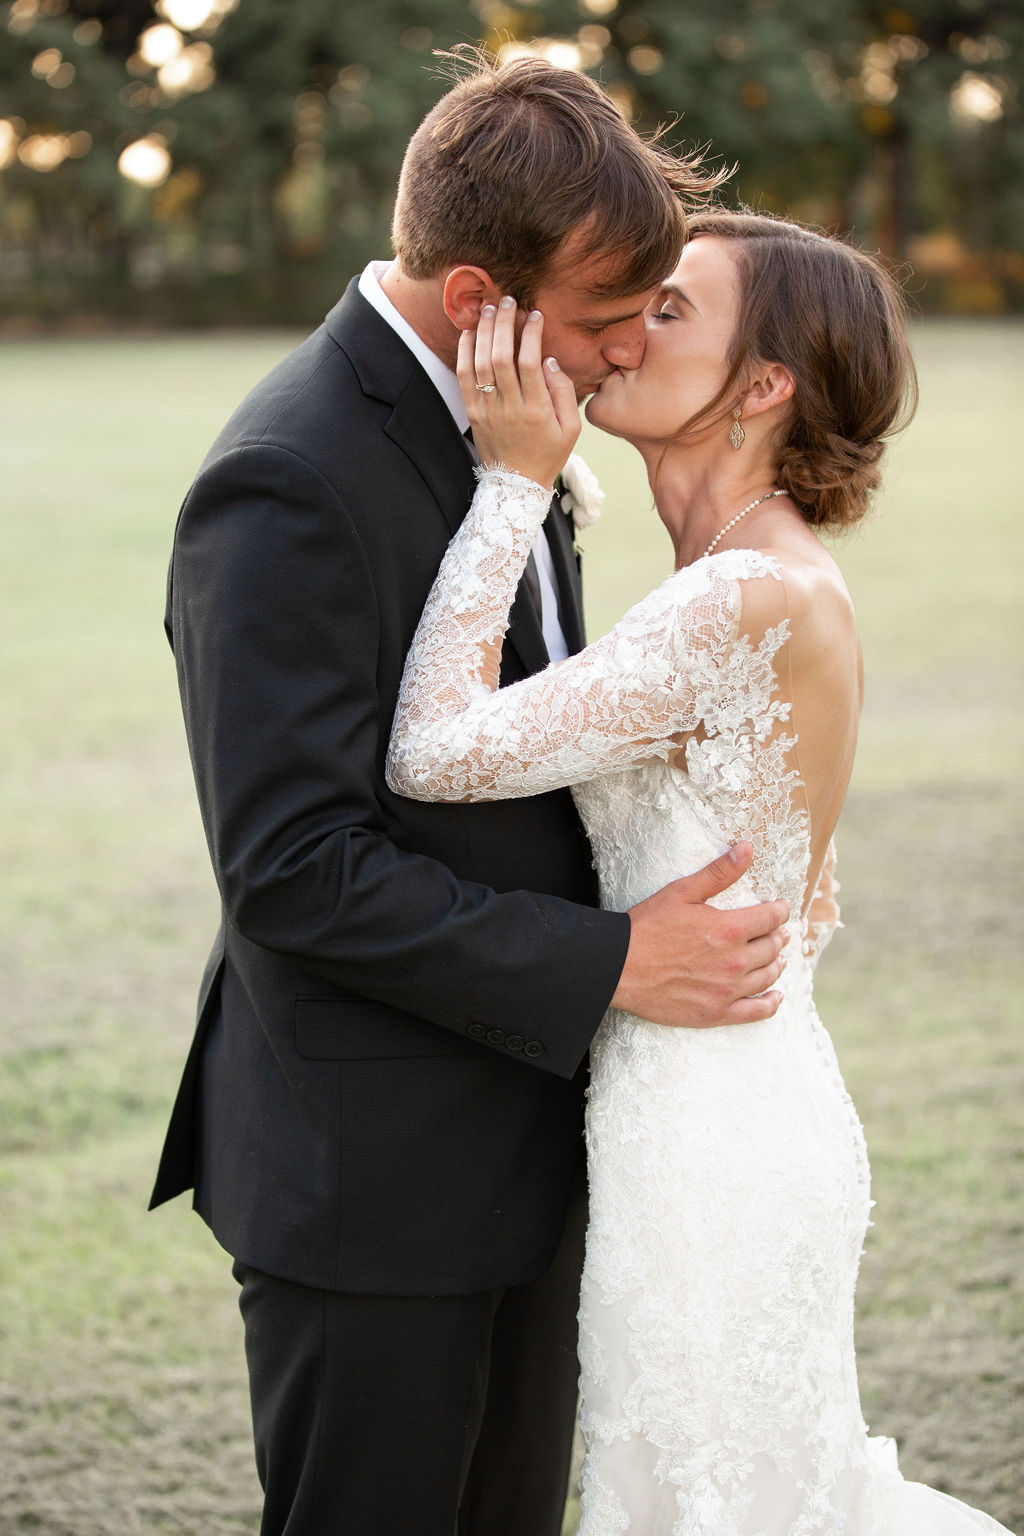 Fort Worth Wedding photography: Modern Minimalistic Wedding at The Emerson